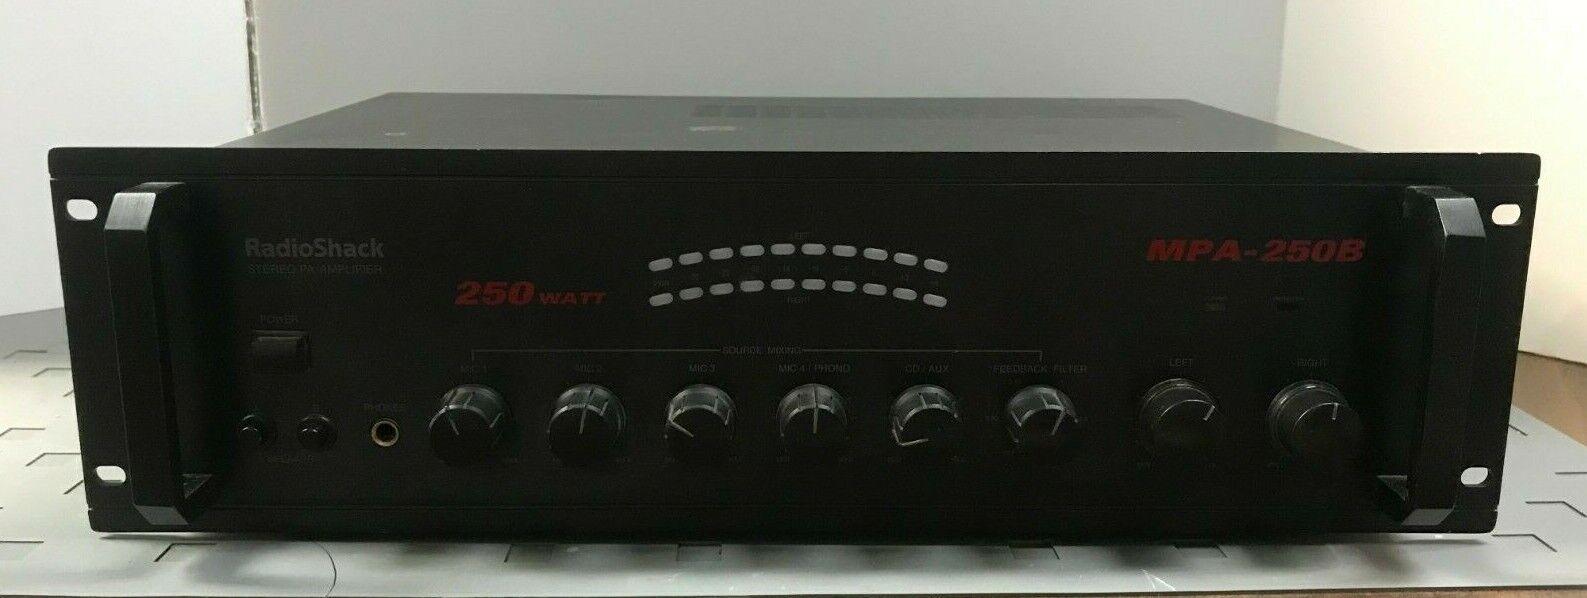 RadioShack Stereo PA Amplifier 250 WATT MPA-250B